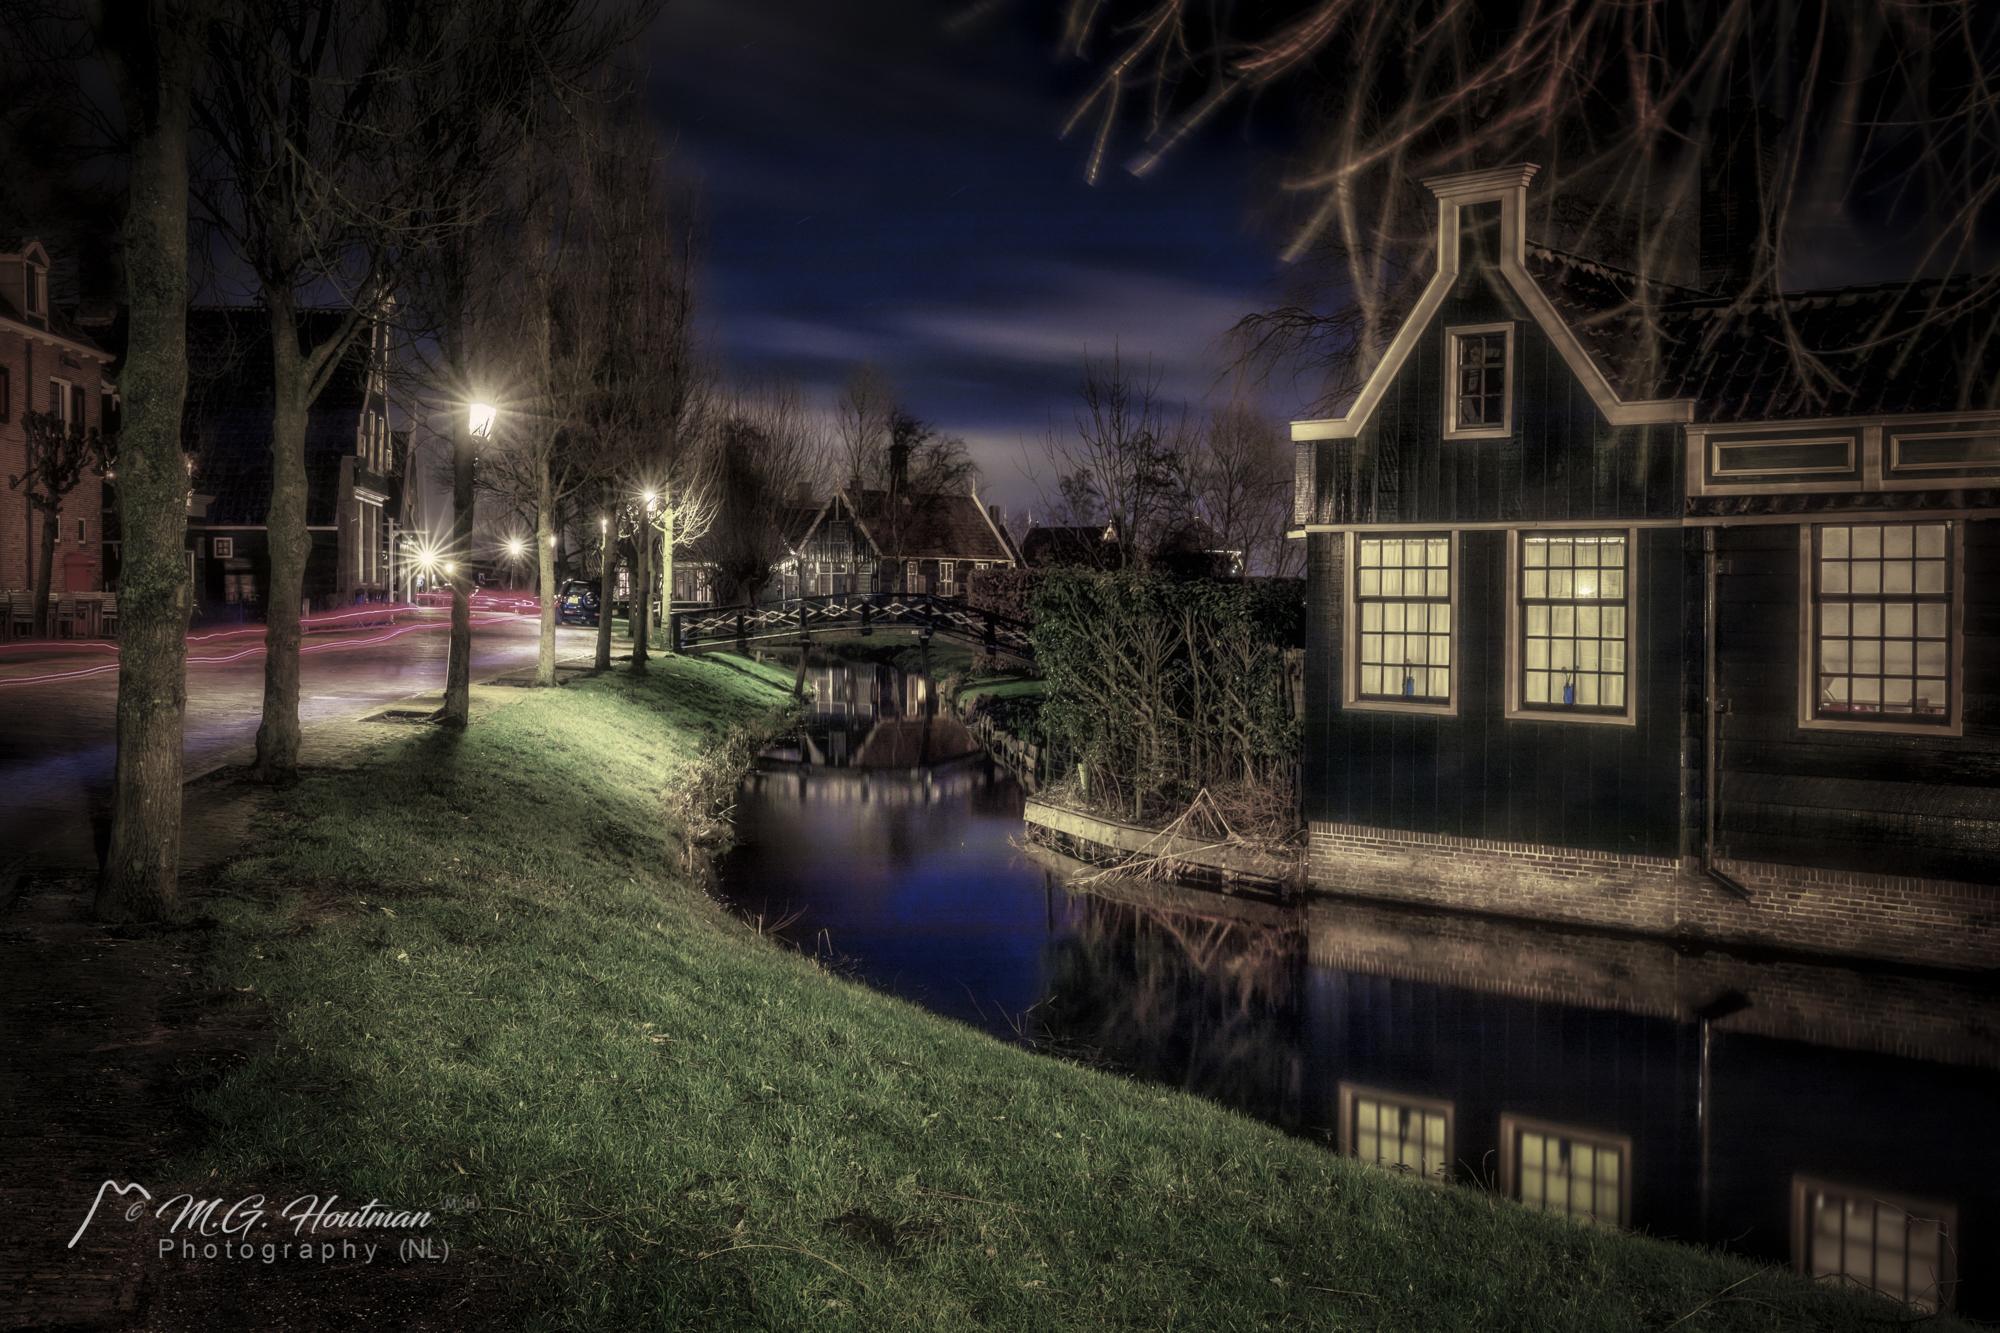 A different corner of Zaanse Schans